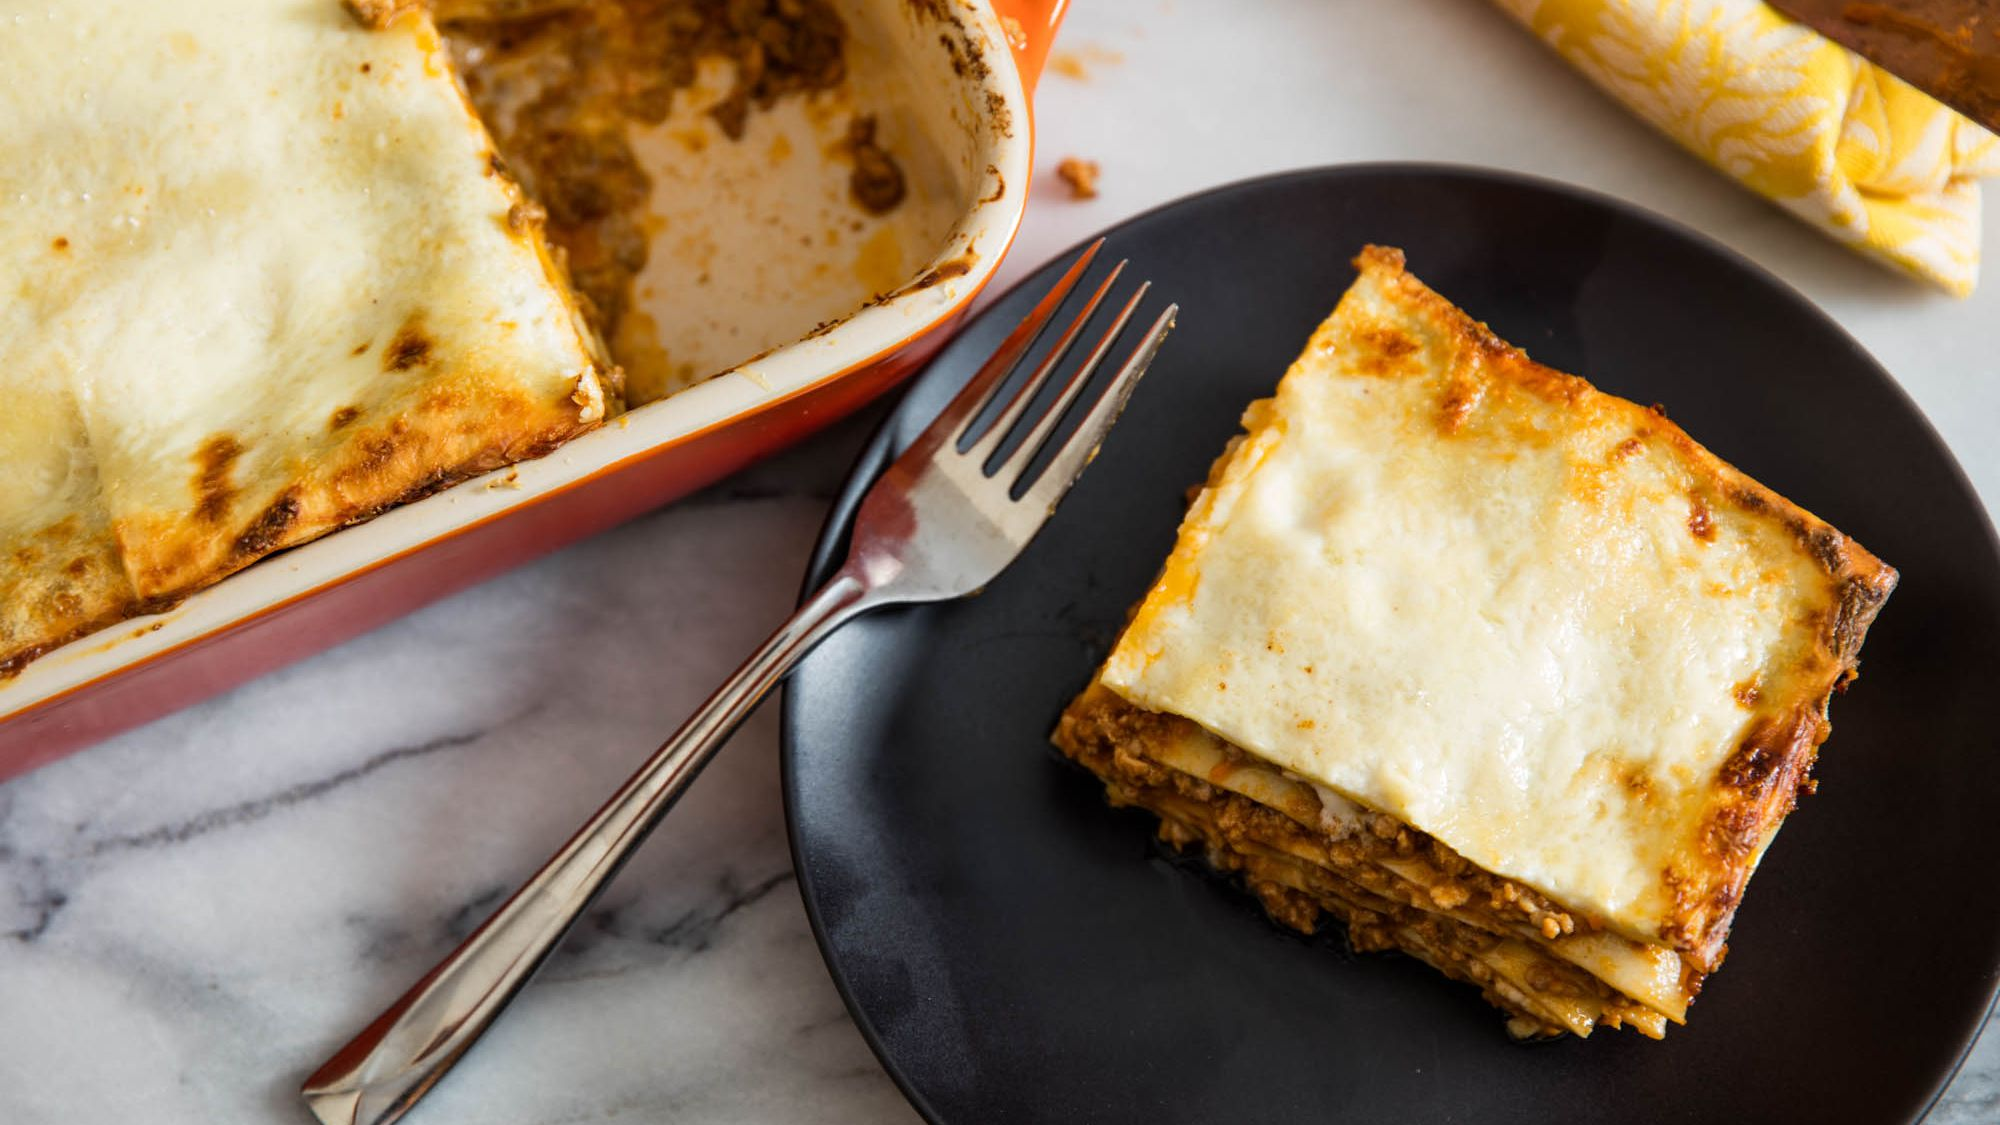 Classic Baked Lasagna Bolognese Lasagne alla Bolognese Recipe